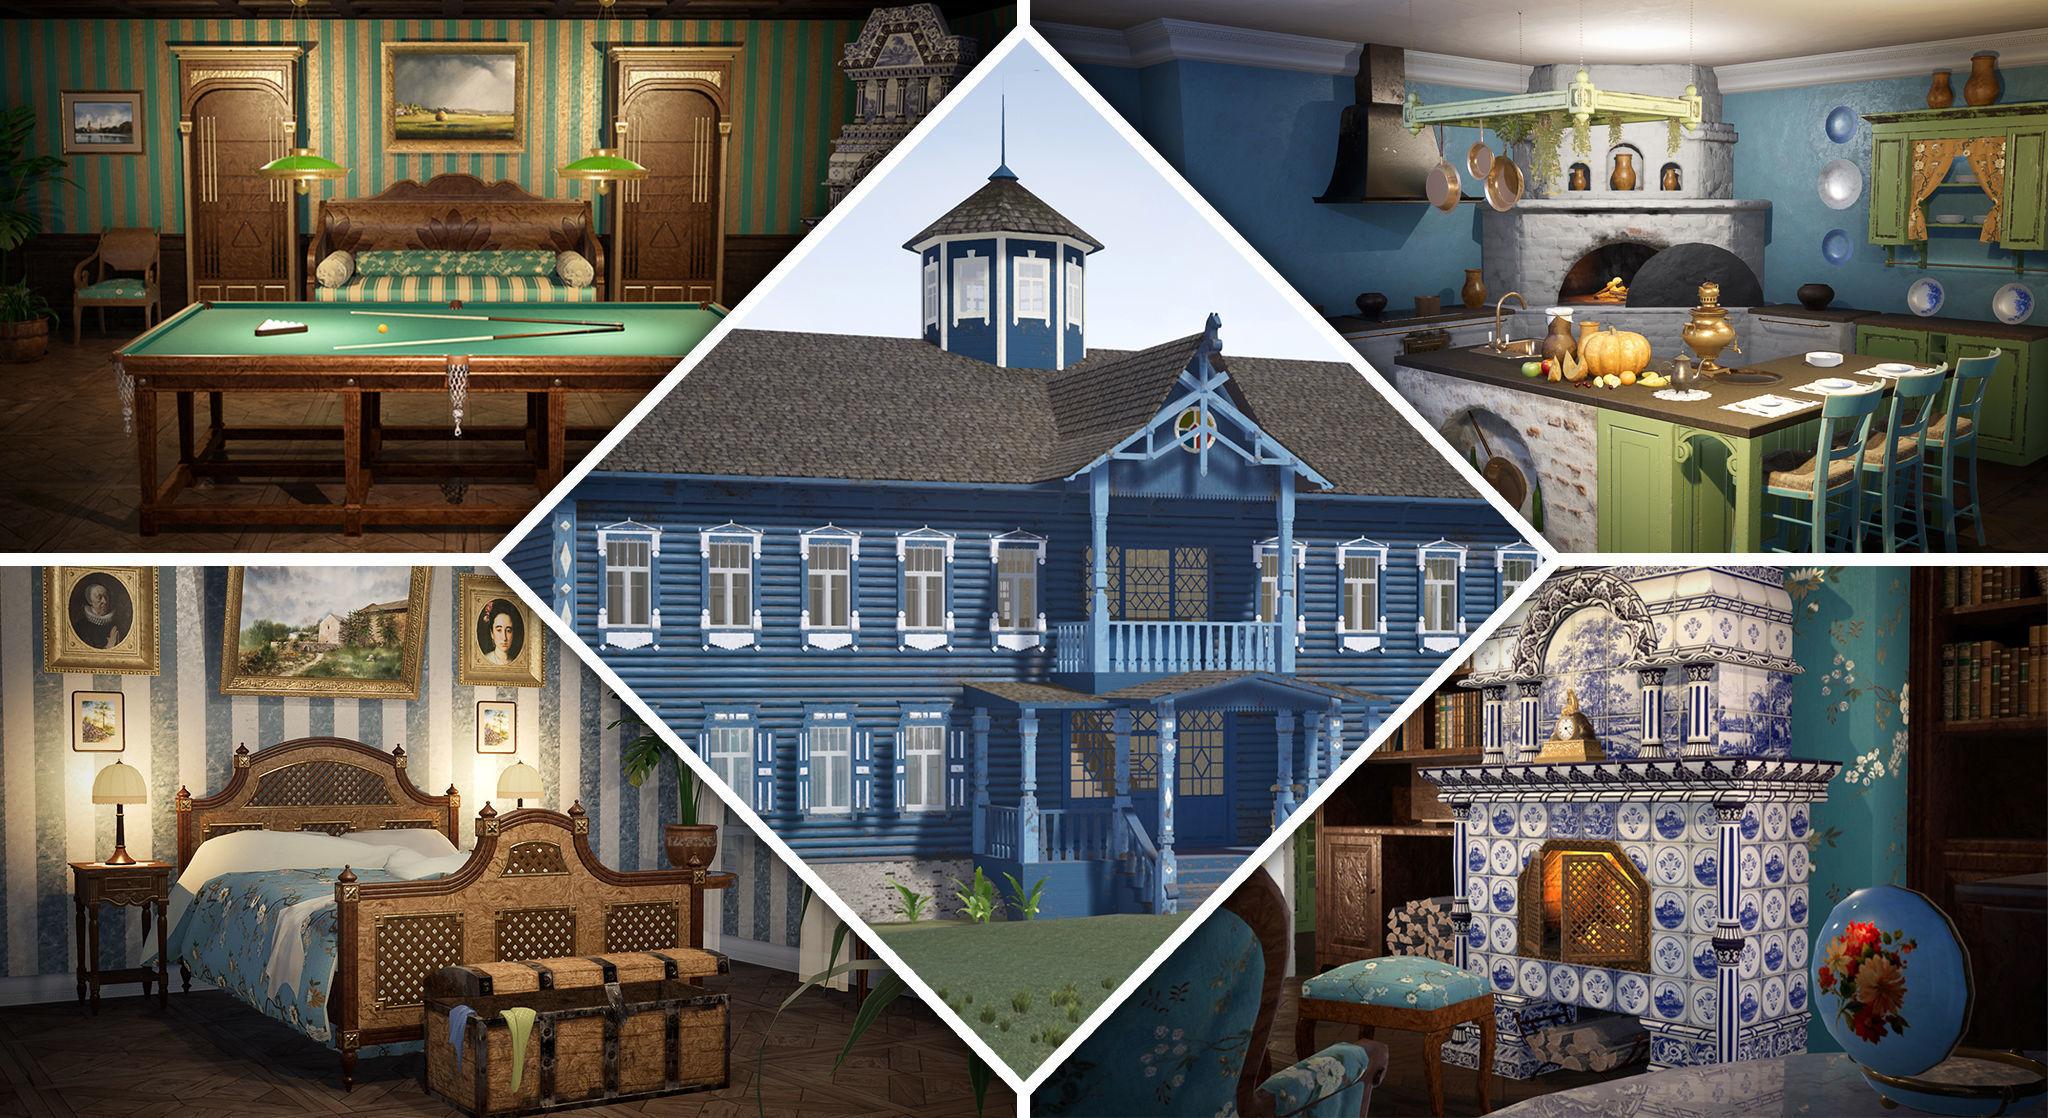 Russian Estate House Unreal Engine 4 | 3D model